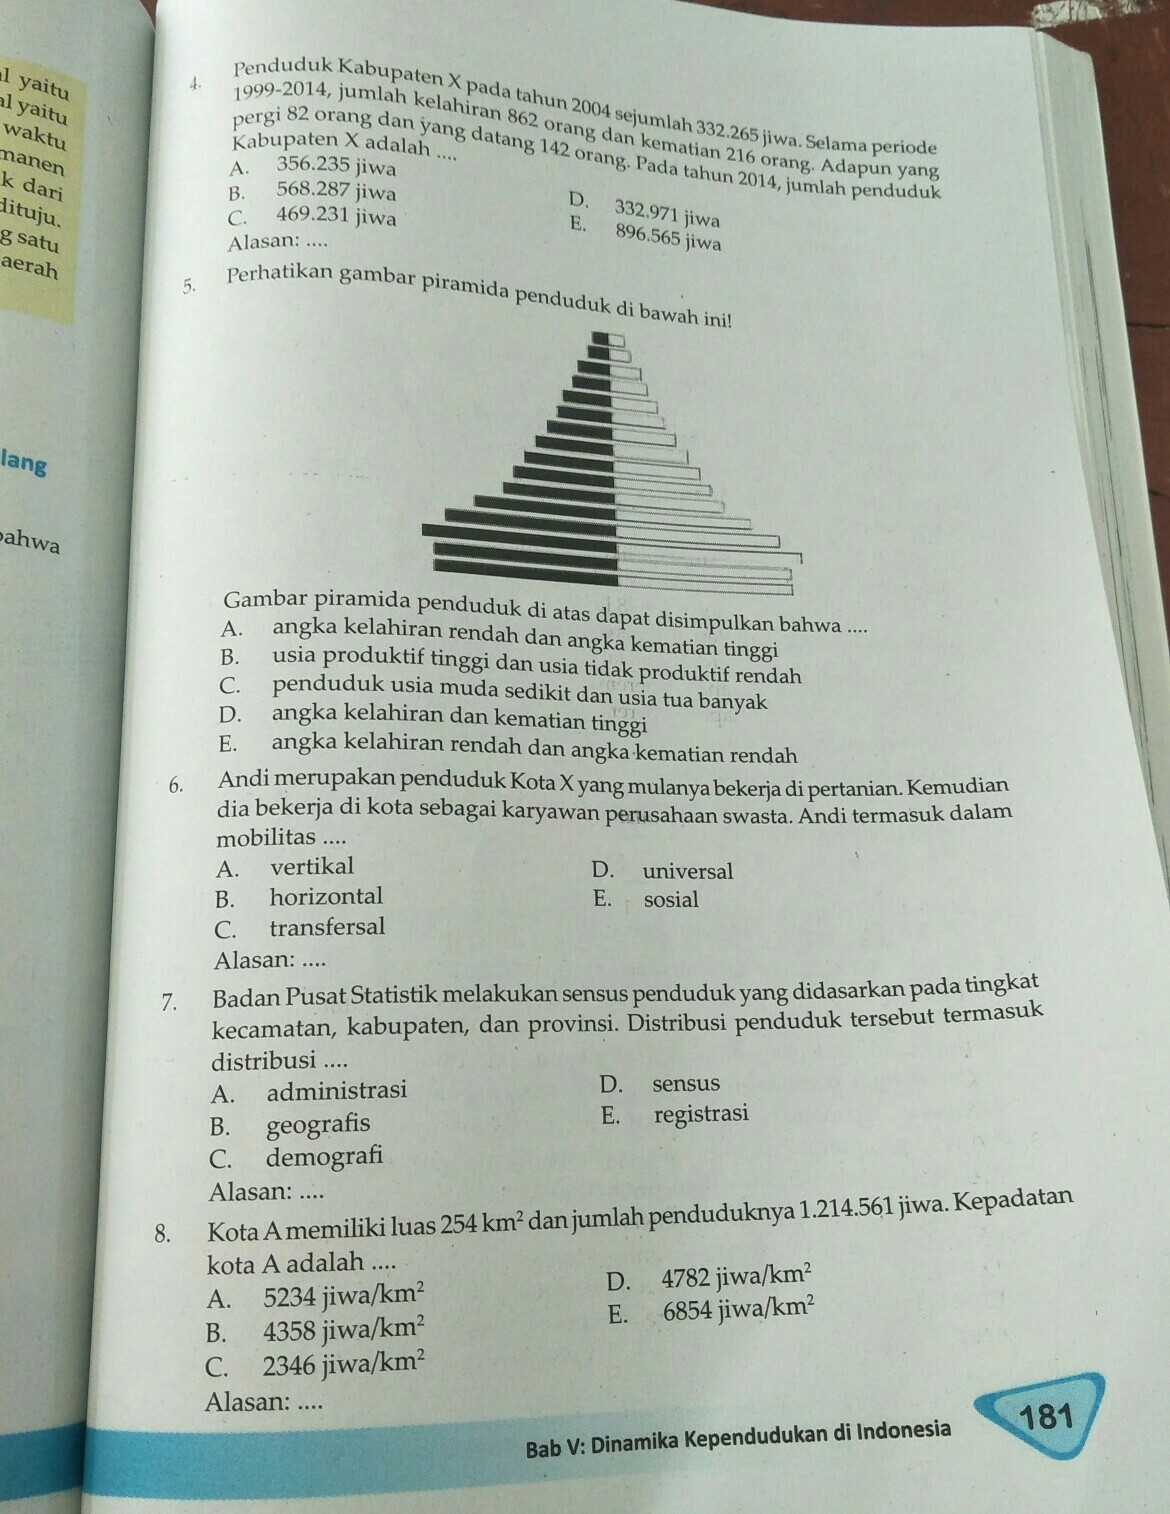 Tolong Jawab Soal Nomor 4 Sampe 8 Beserta Alasannya Kenapa Brainly Co Id